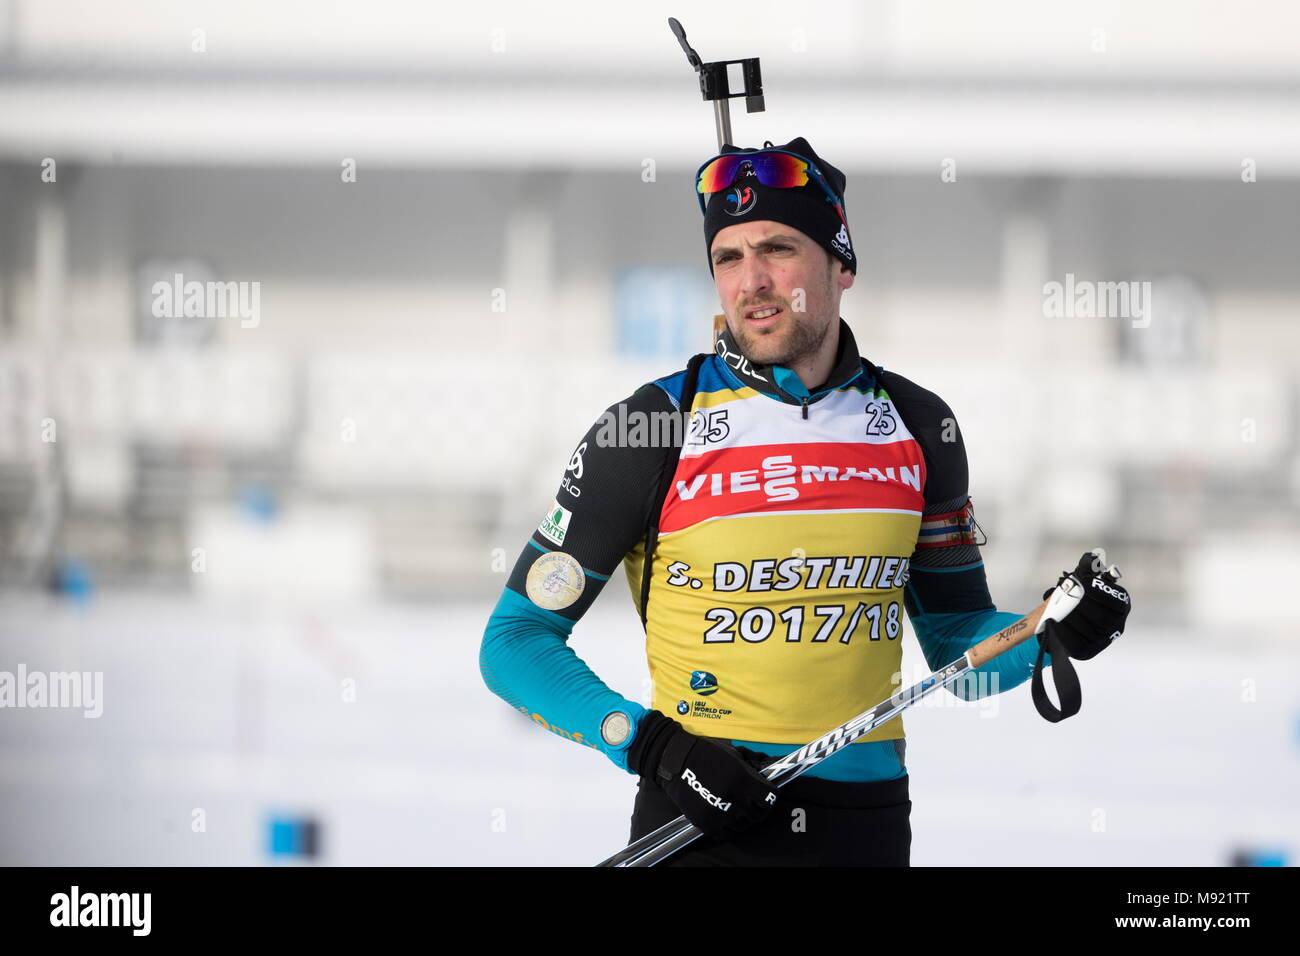 Biathlon in 2017-2018: World Cup 27